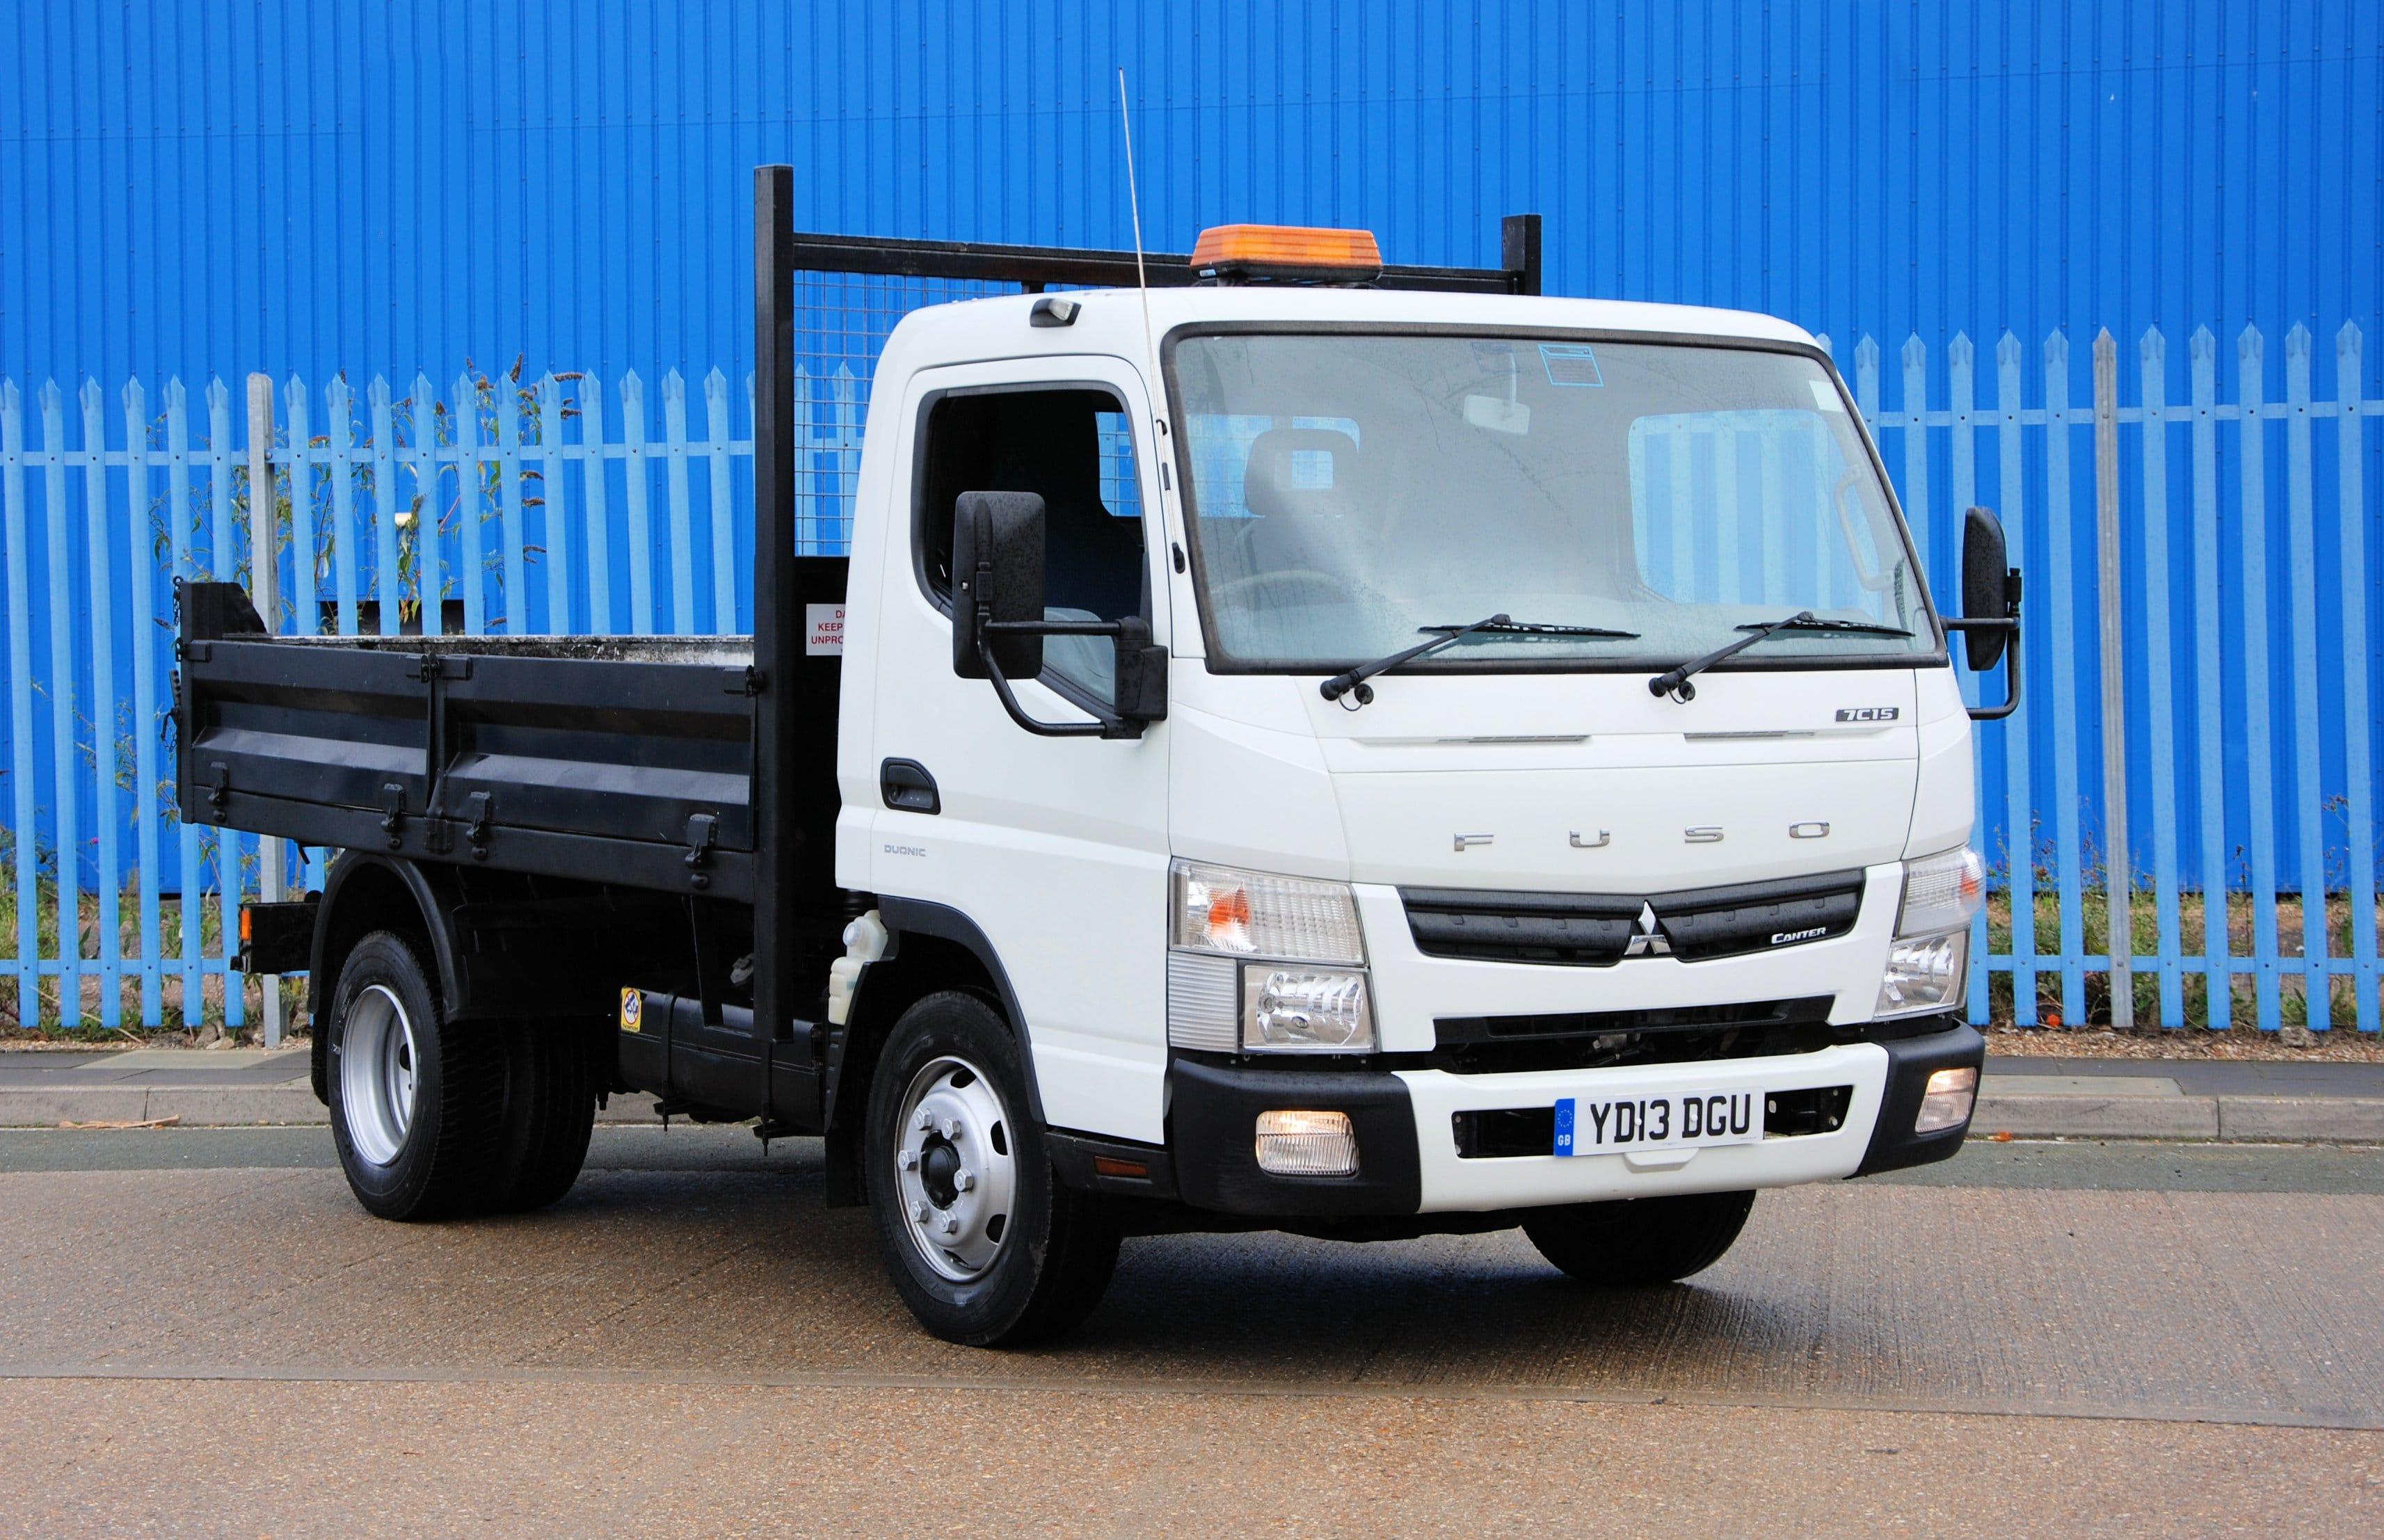 mitsubishi fuso canter 7c15 2013 13 7 5 ton dropside tipper euro 5 chris hodge trucks. Black Bedroom Furniture Sets. Home Design Ideas